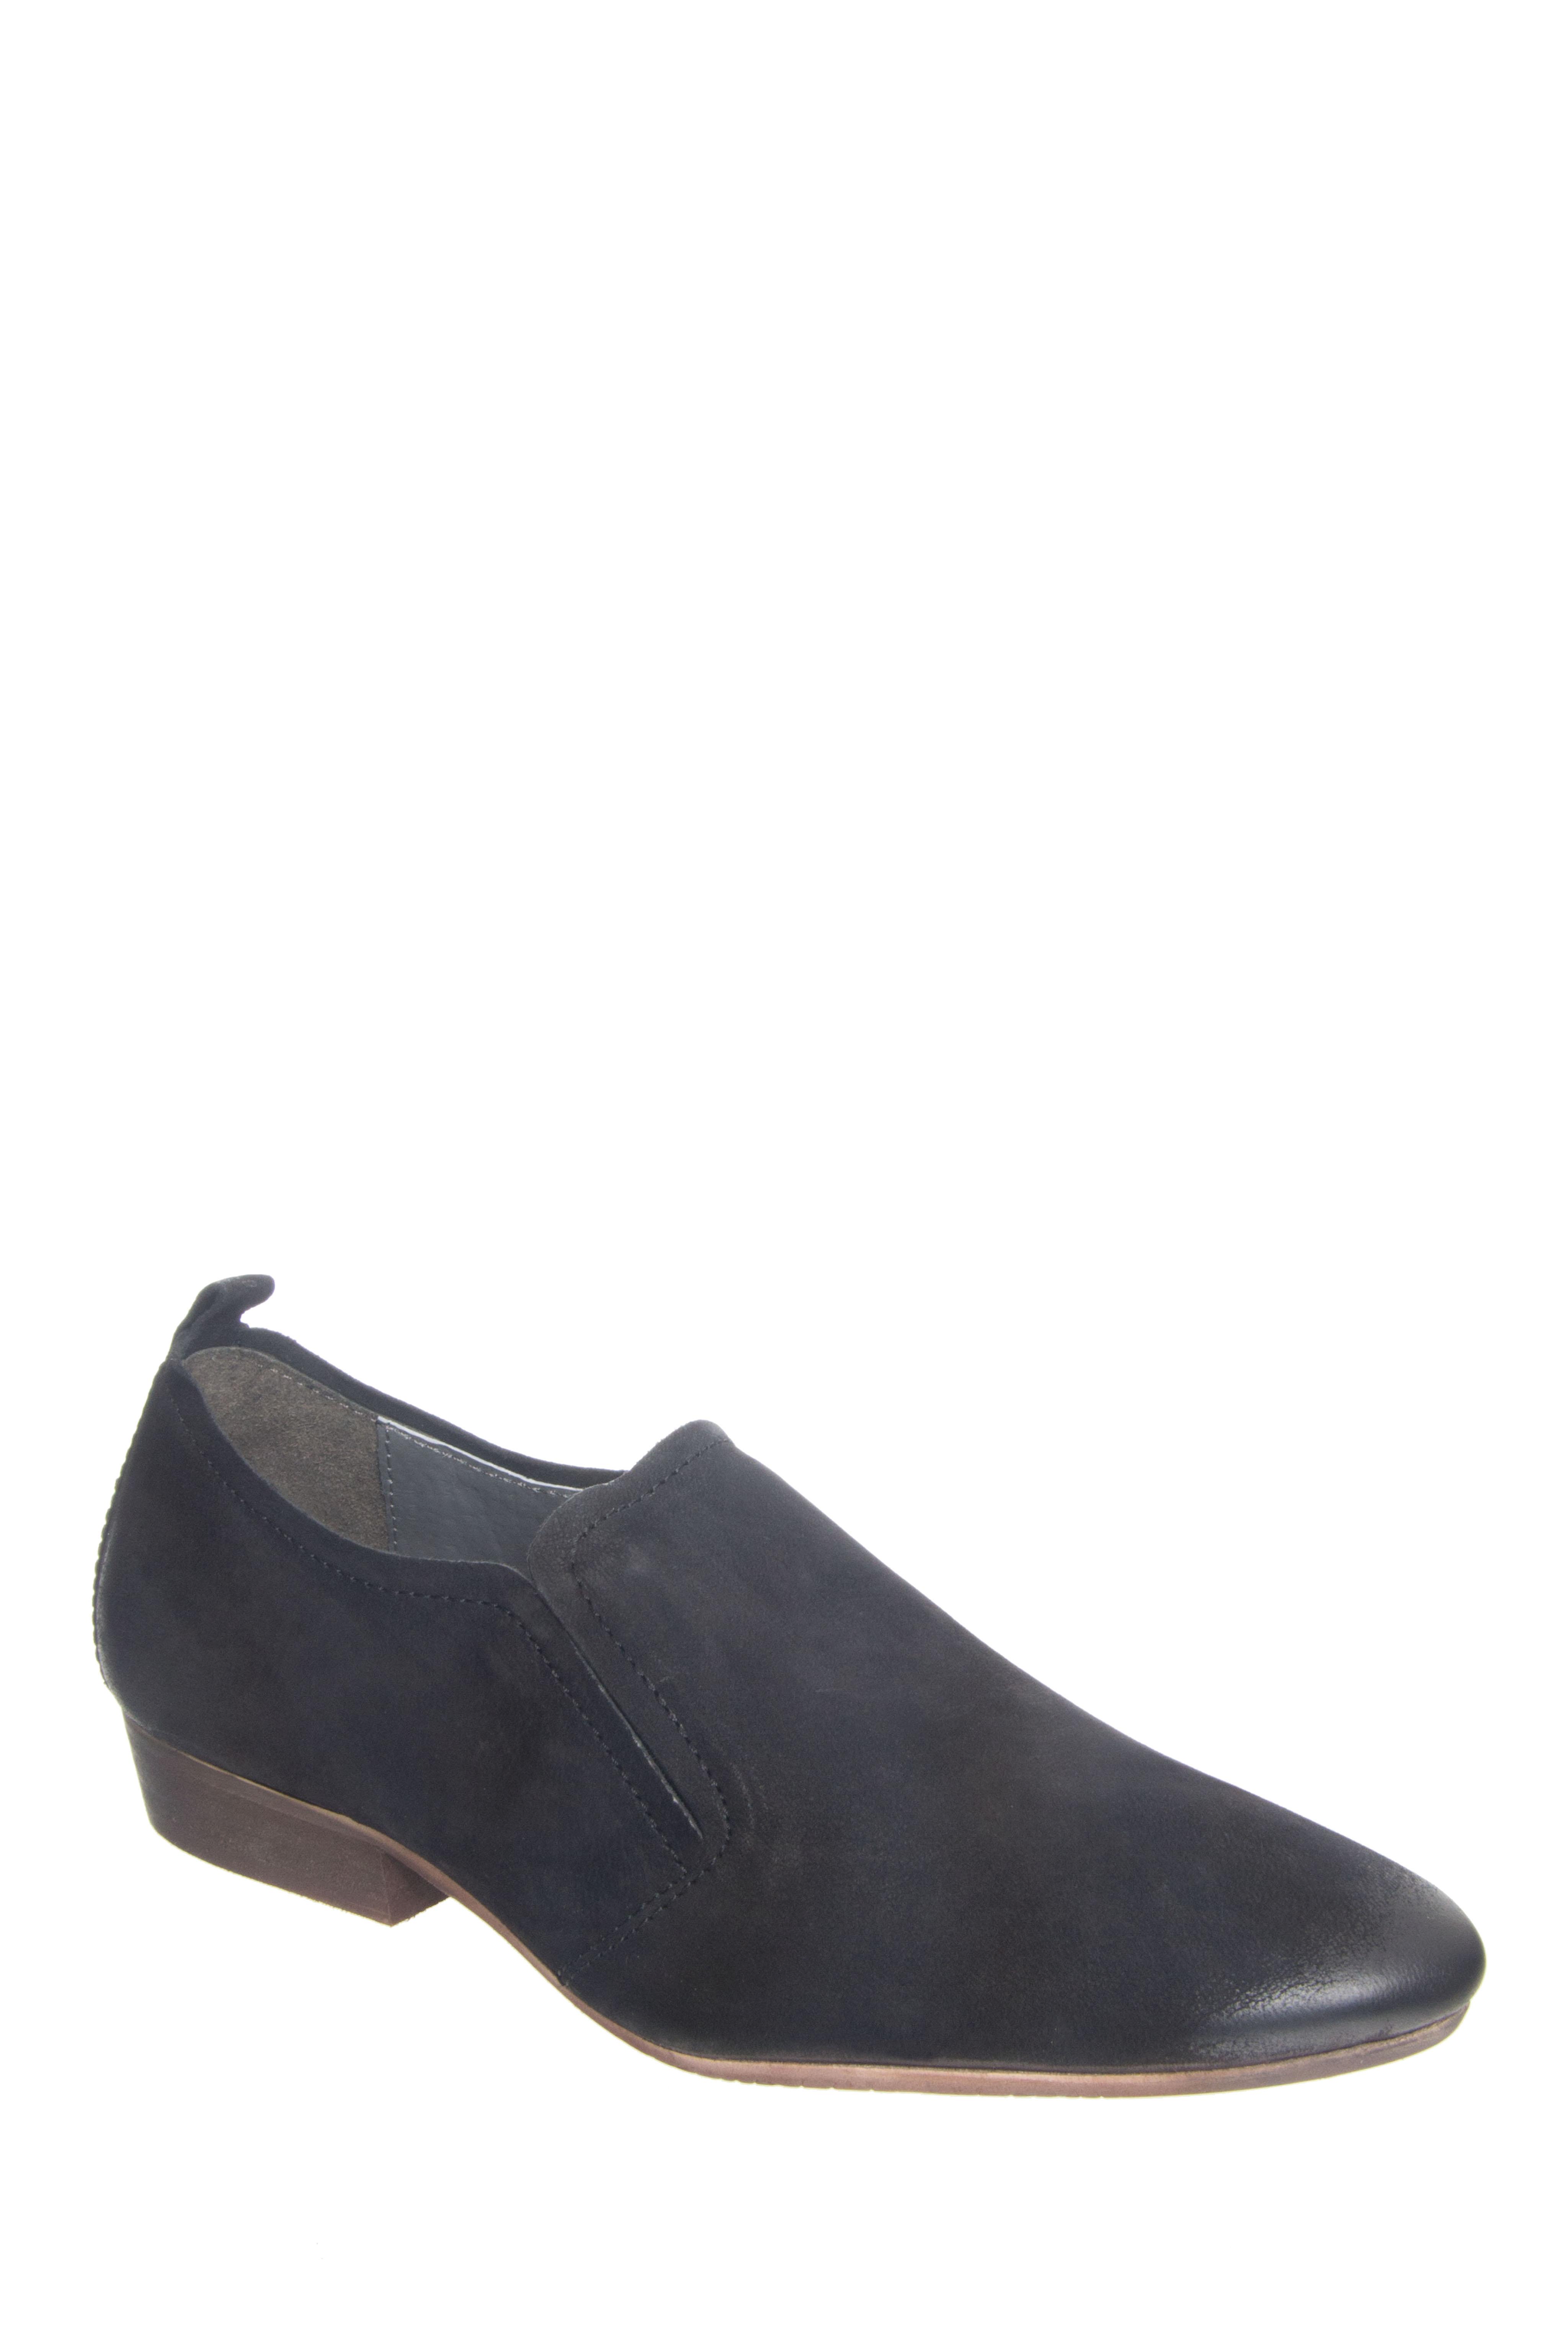 Seychelles Skein Low Heel Loafers - Black